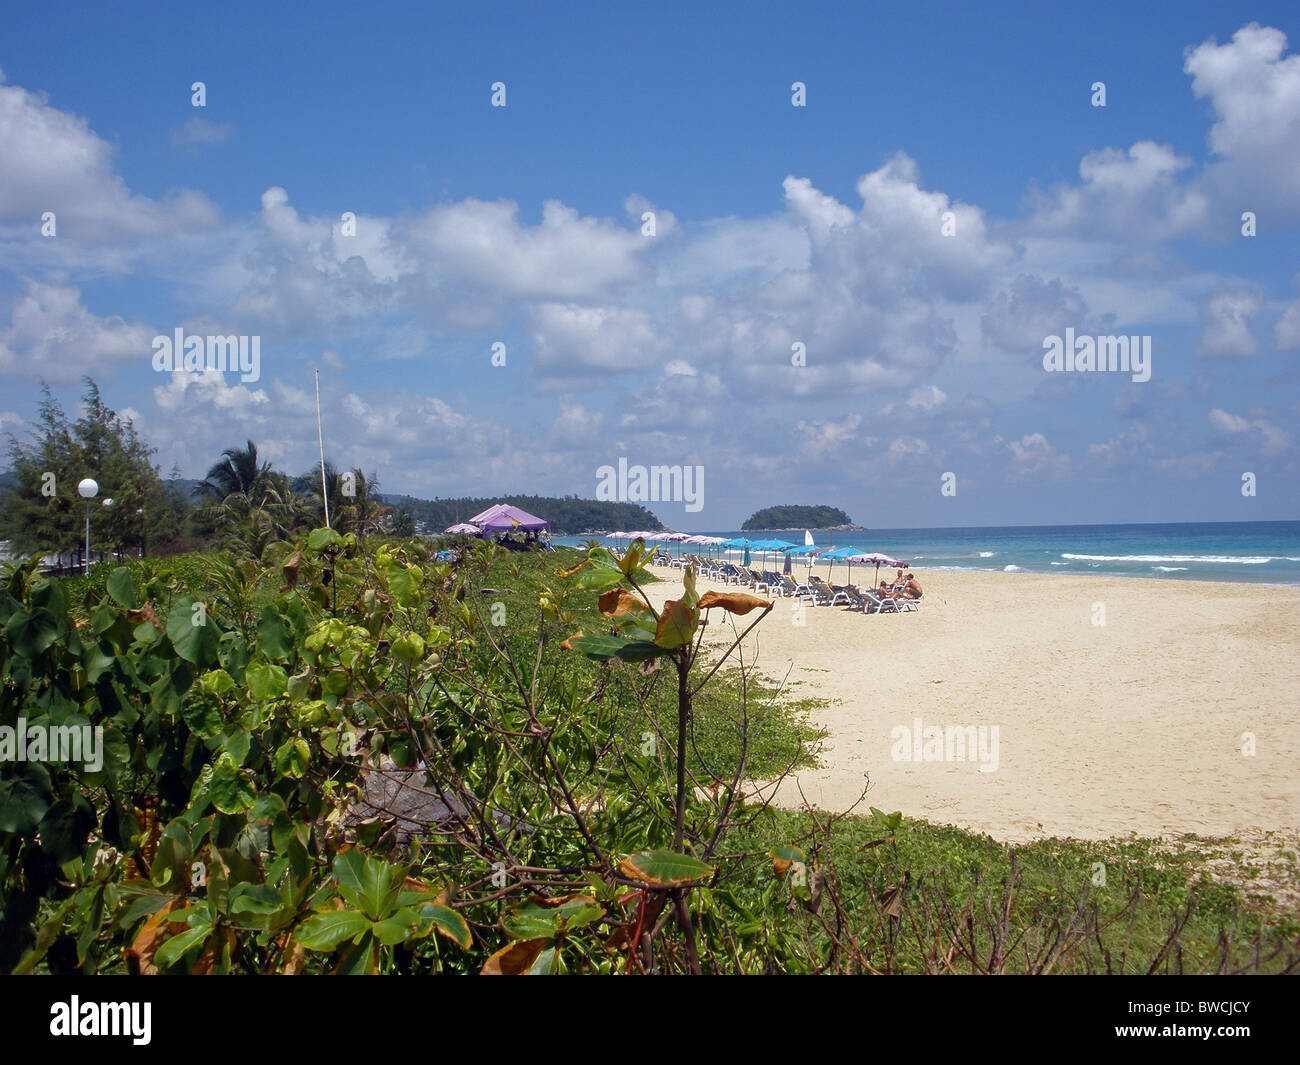 View along Karon Beach, Phuket, South Thailand, Far East. - Stock Image